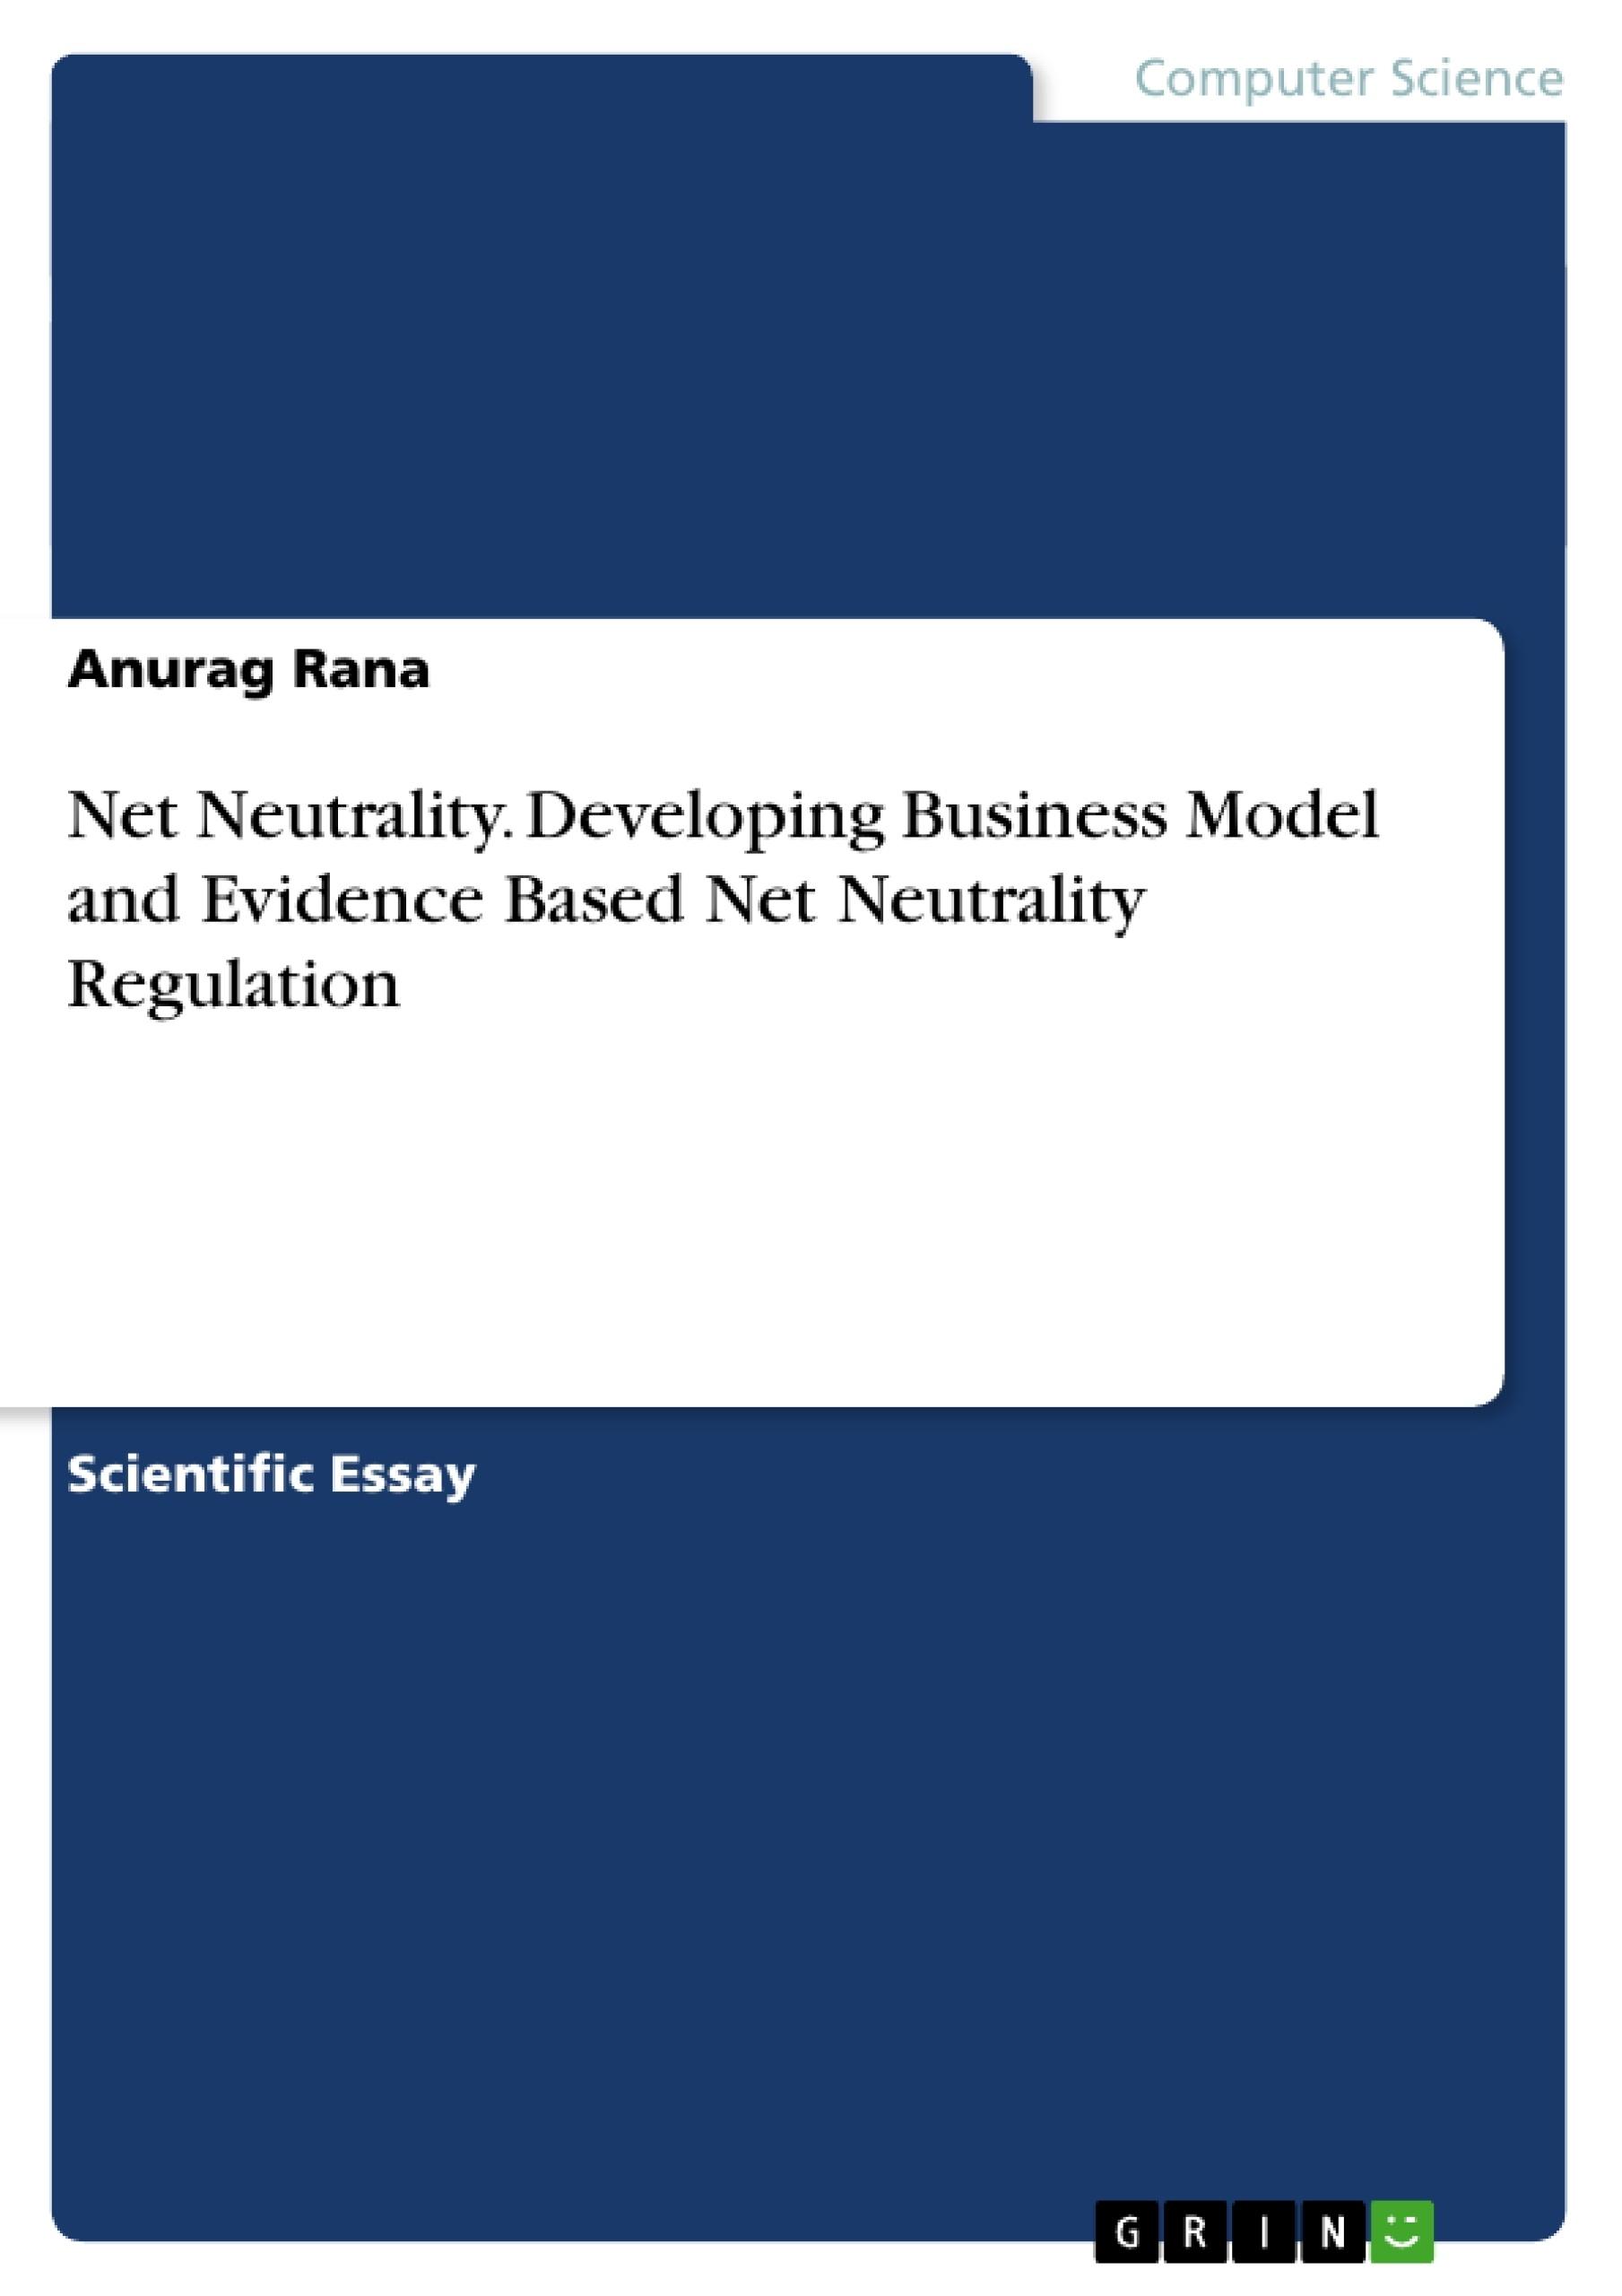 Title: Net Neutrality. Developing Business Model and Evidence Based Net Neutrality Regulation